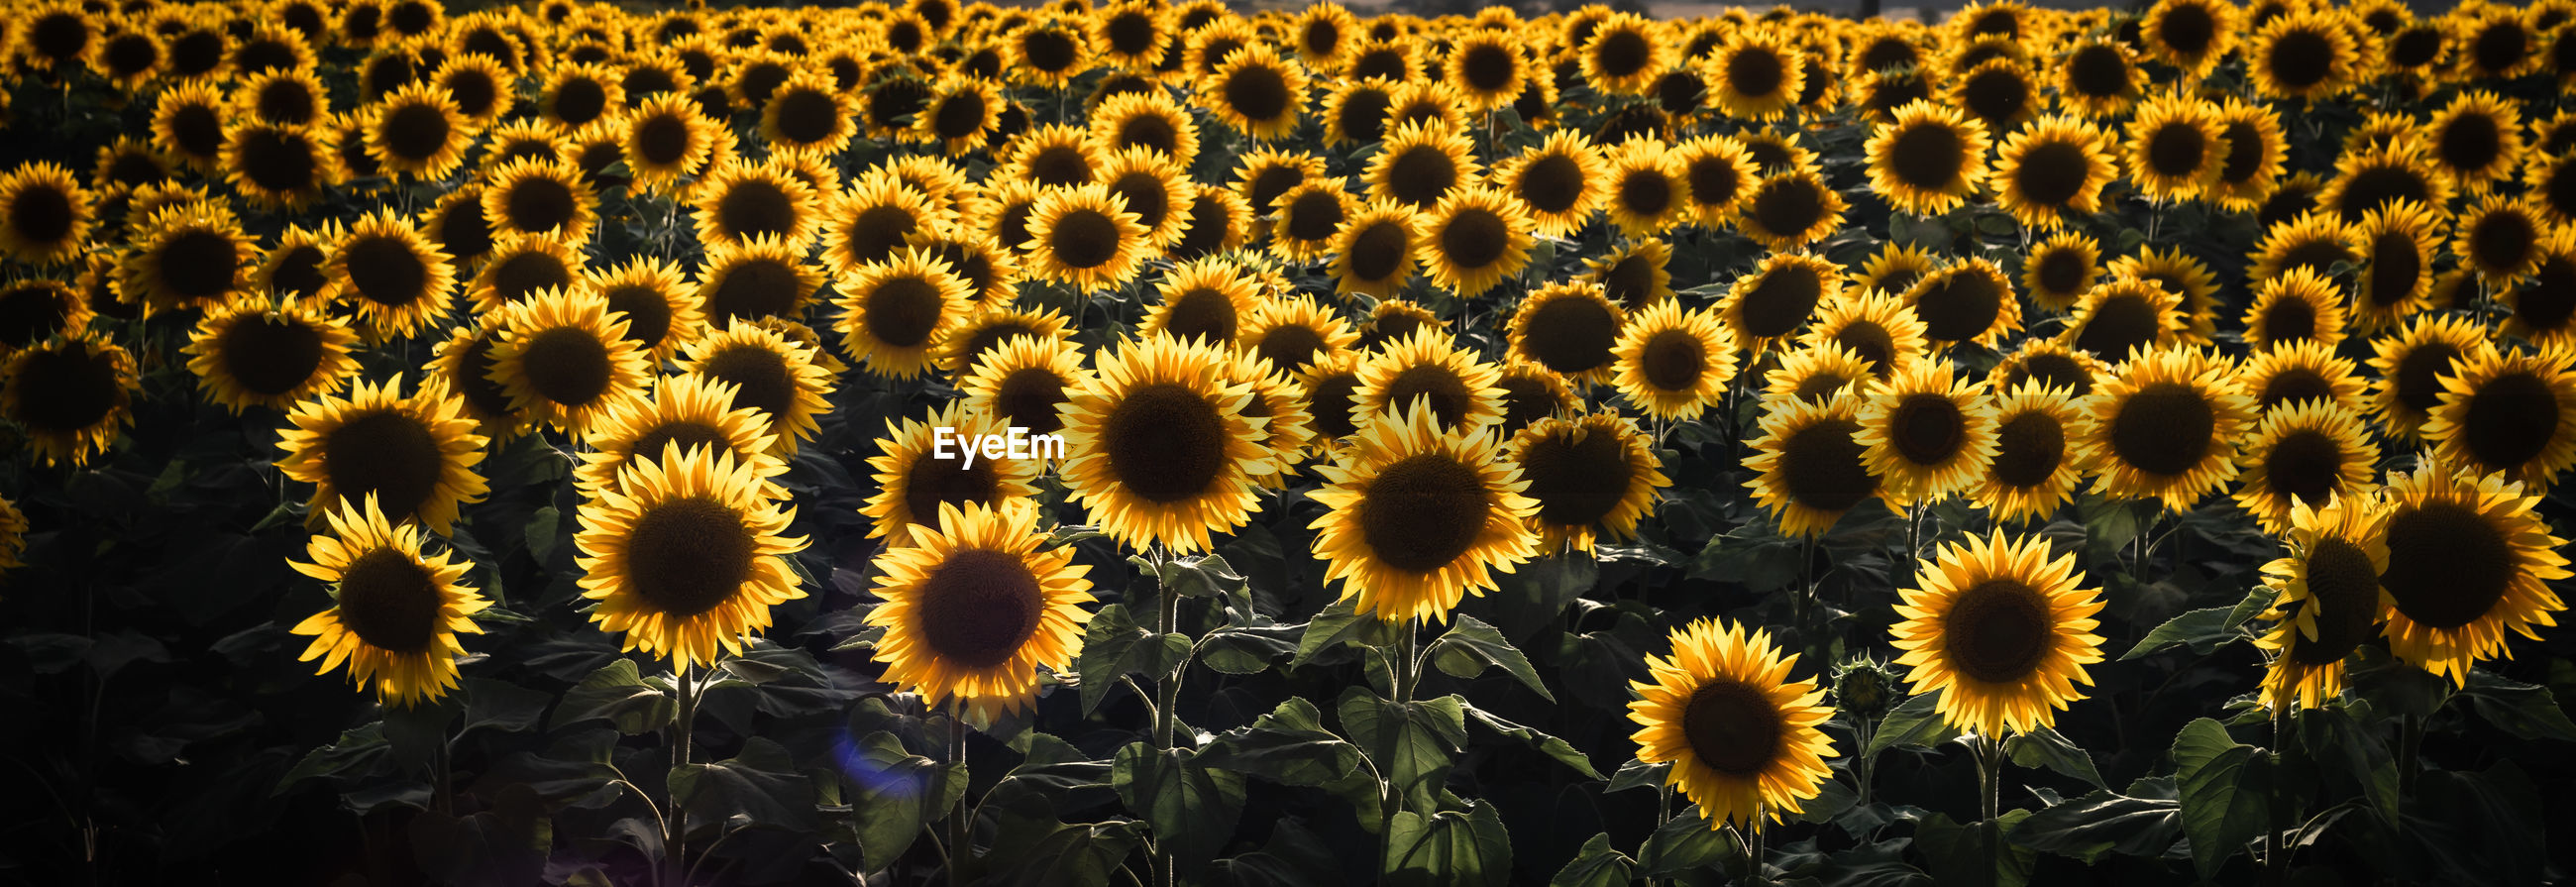 Scenery of sunflower crops on a field